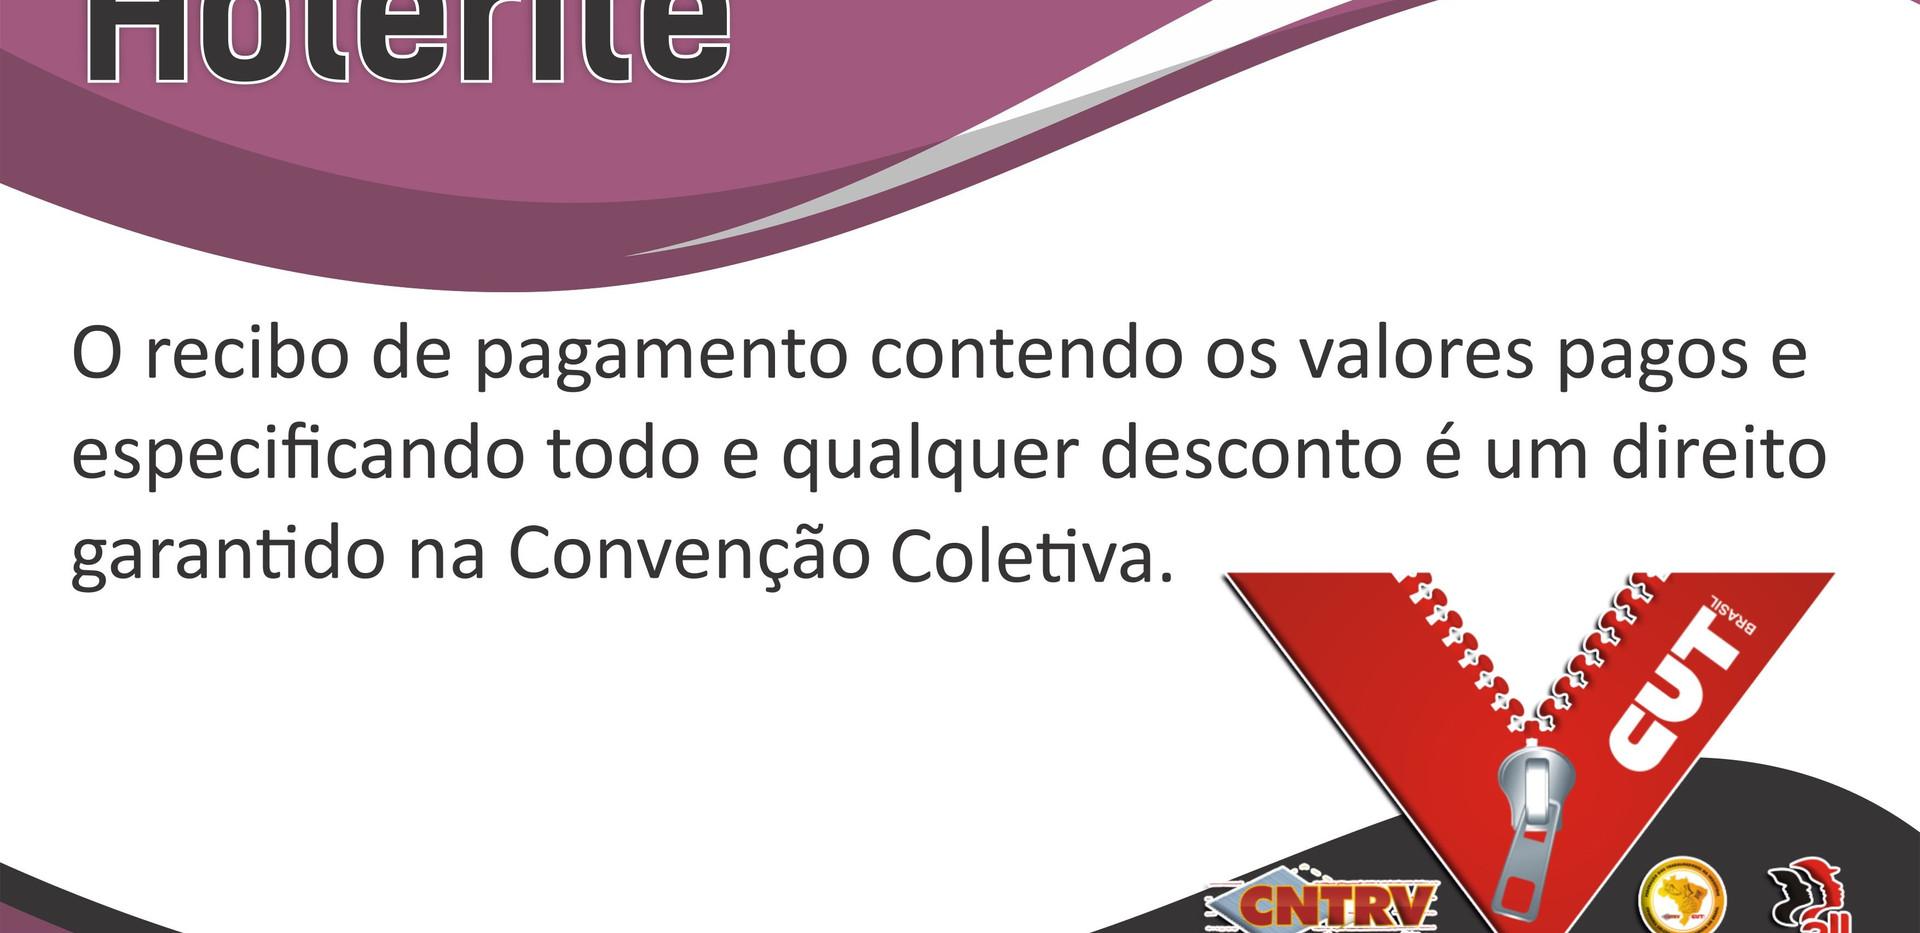 campanha novembro holerite.jpg